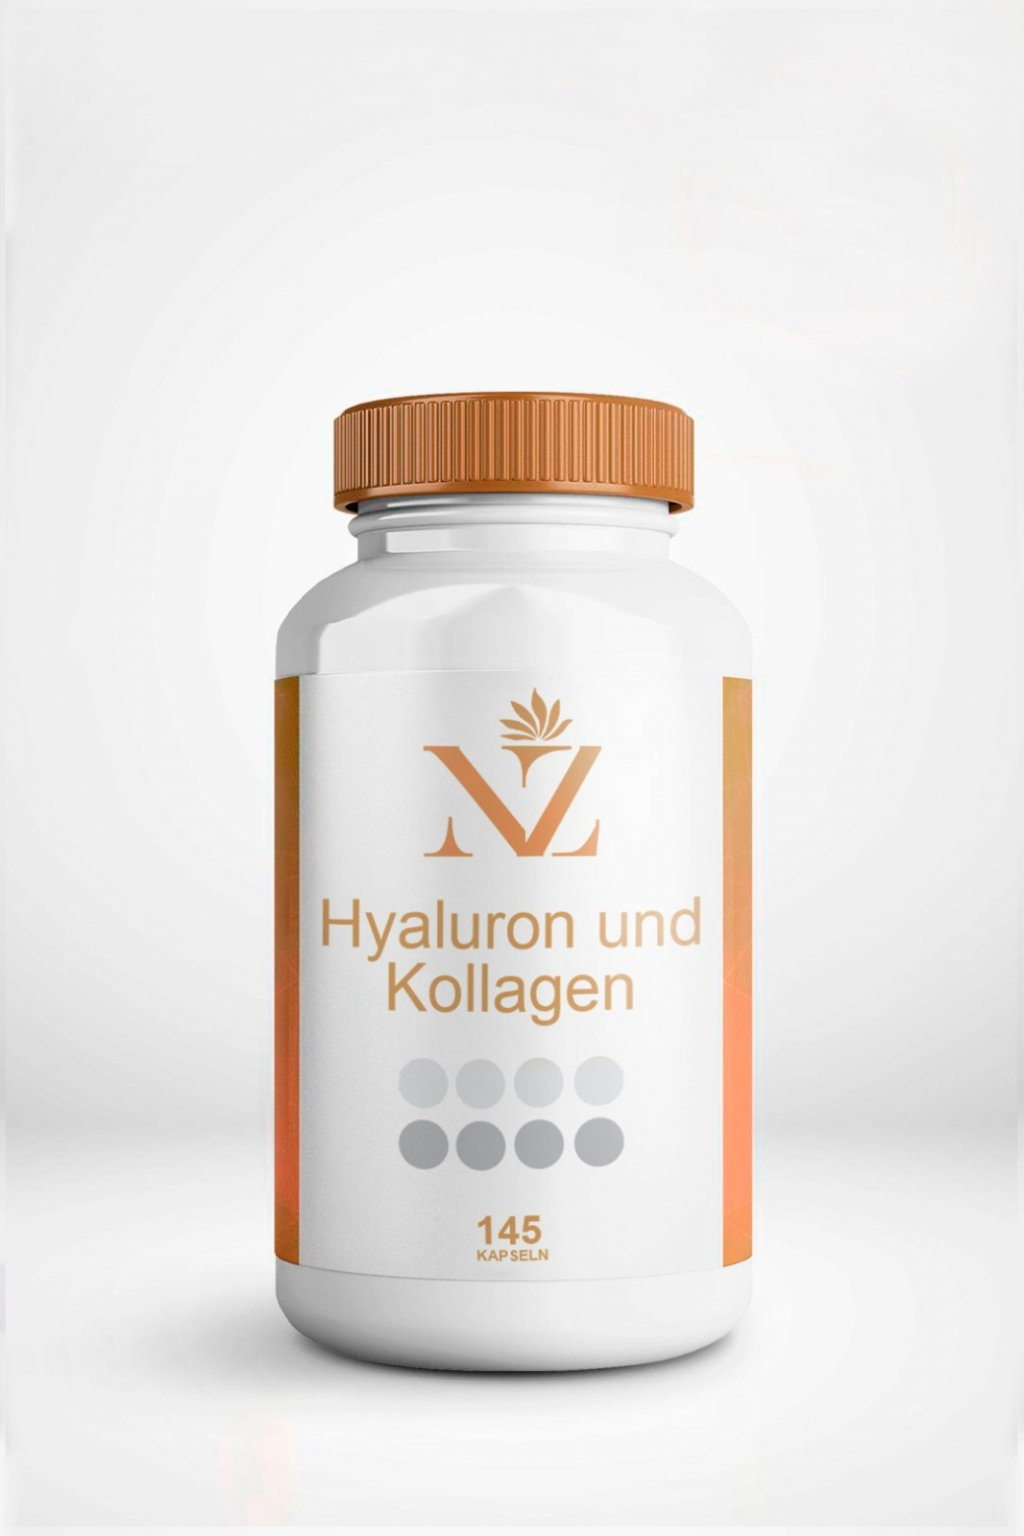 NZ Kyselina hyalurónová a kolagén 1080x1620px